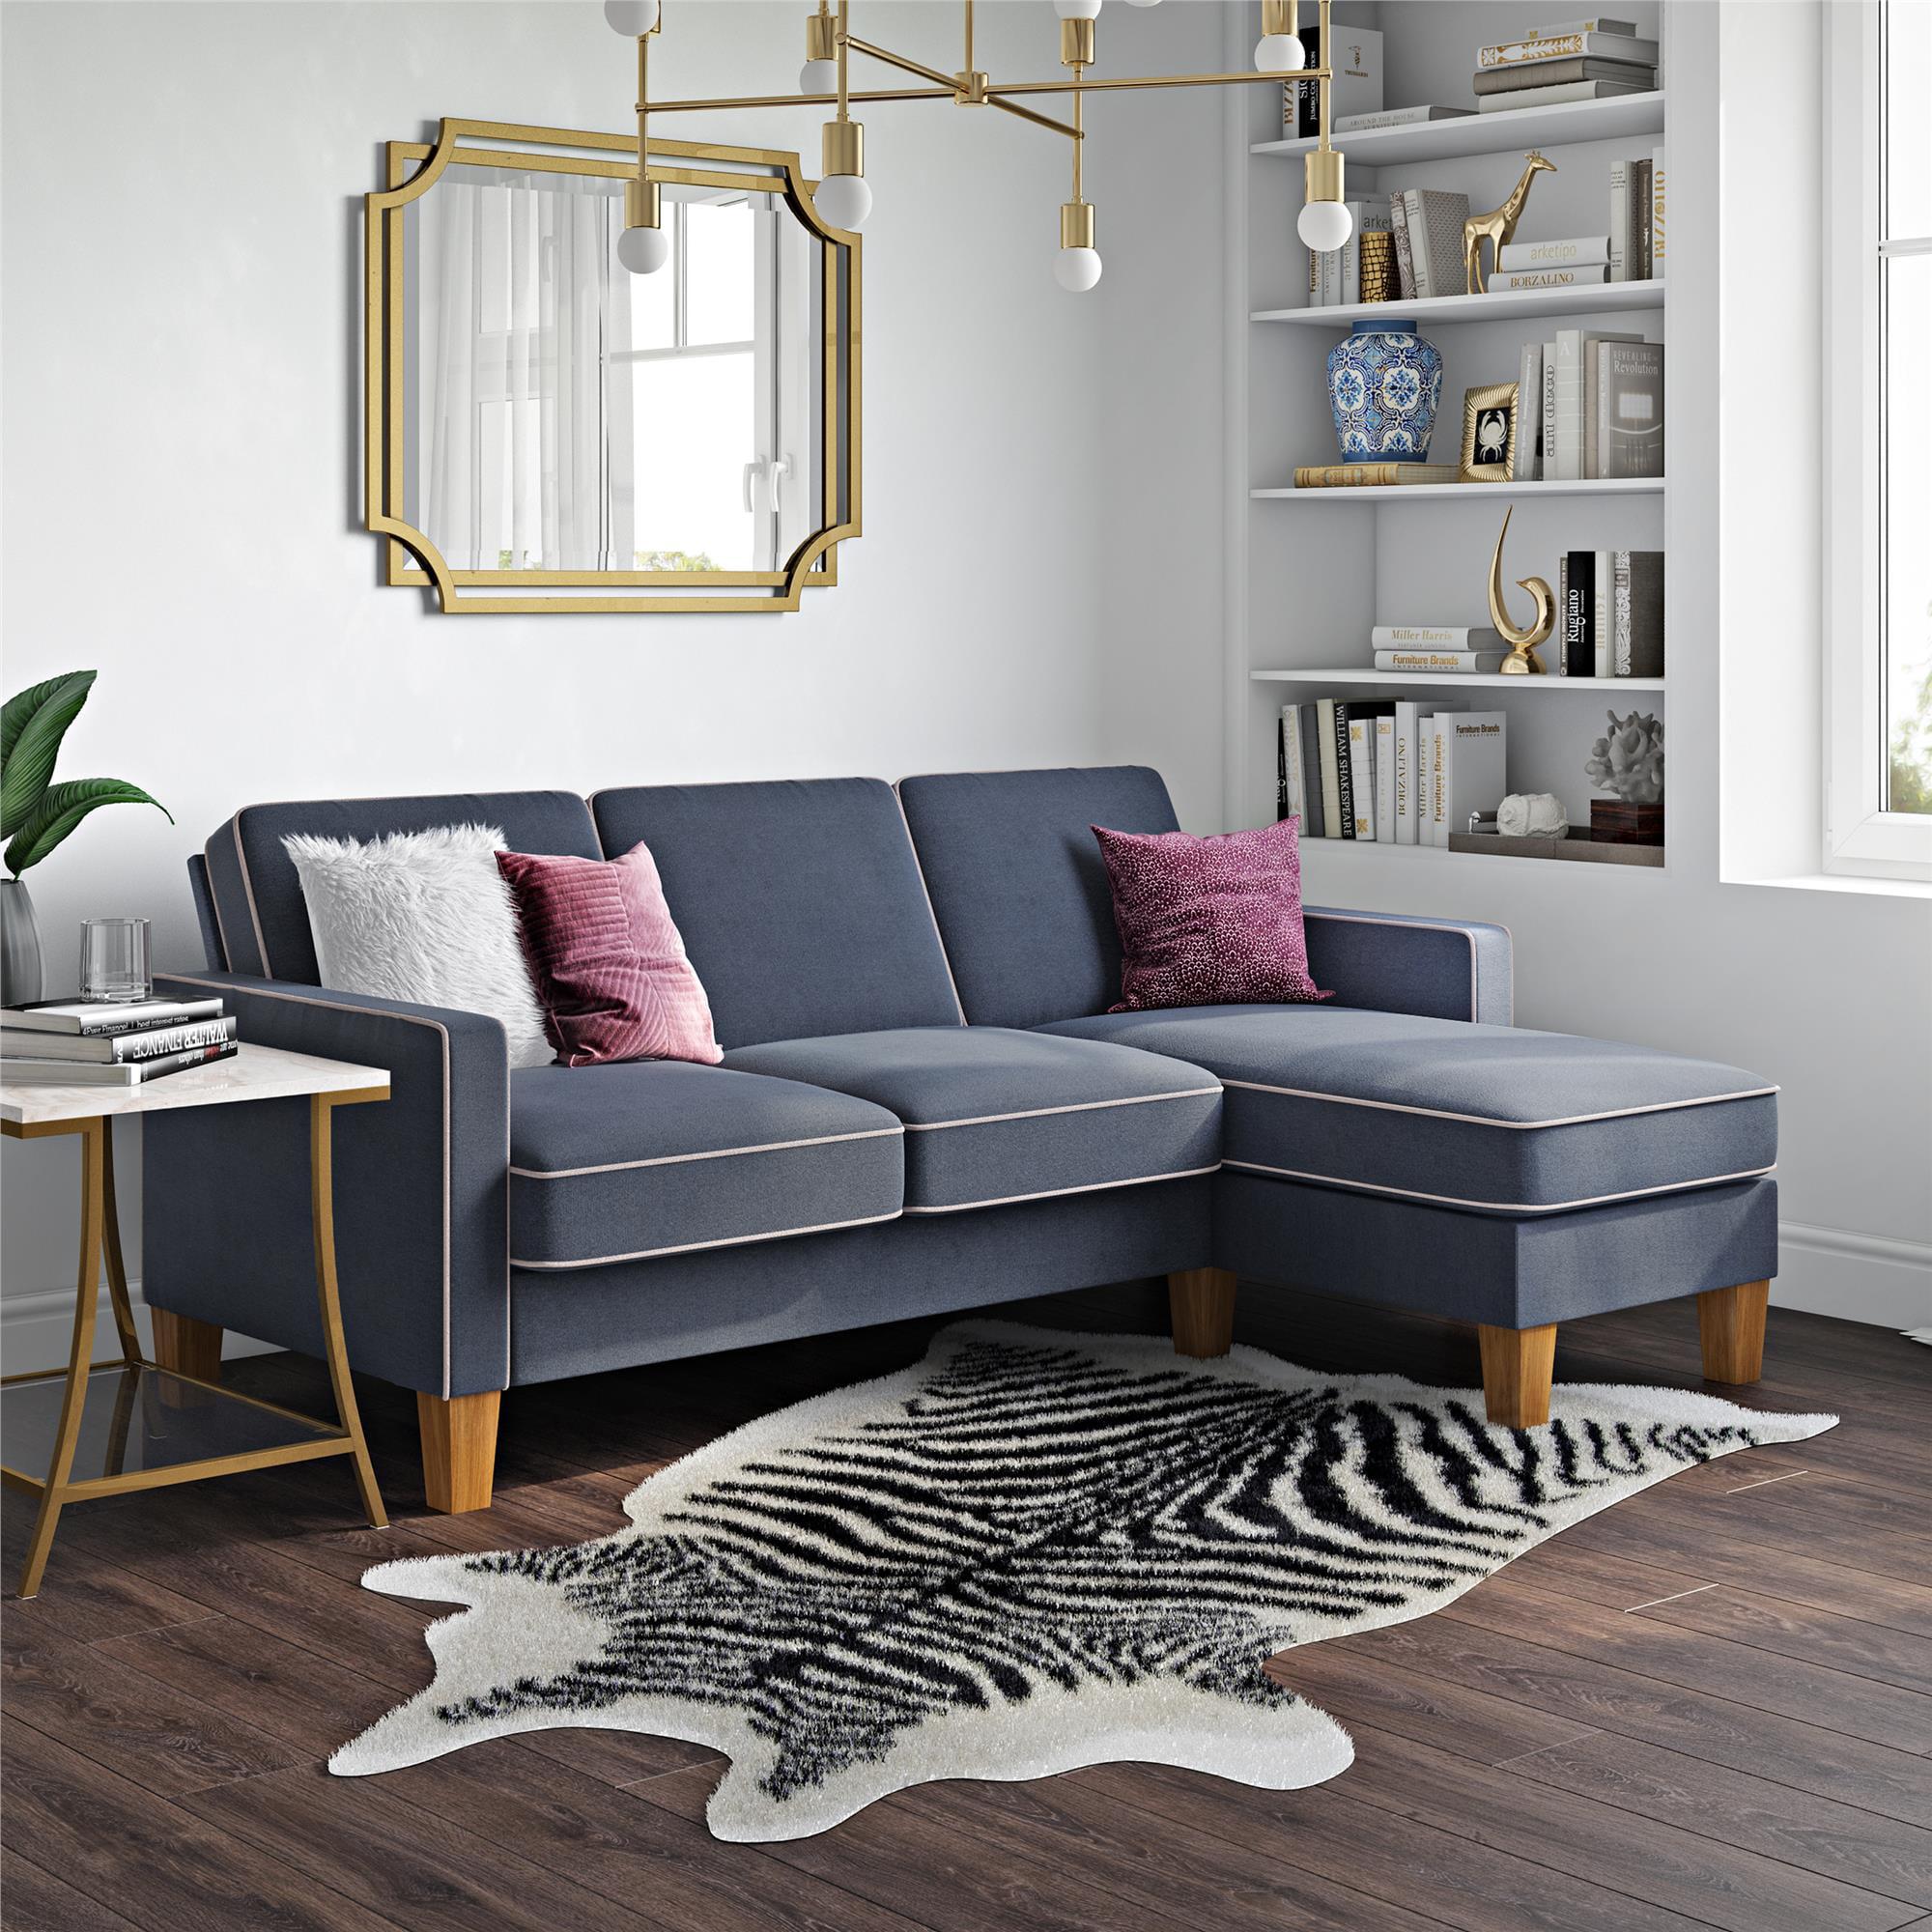 Novogratz Bowen Sectional Sofa With Contrast Welting Blue